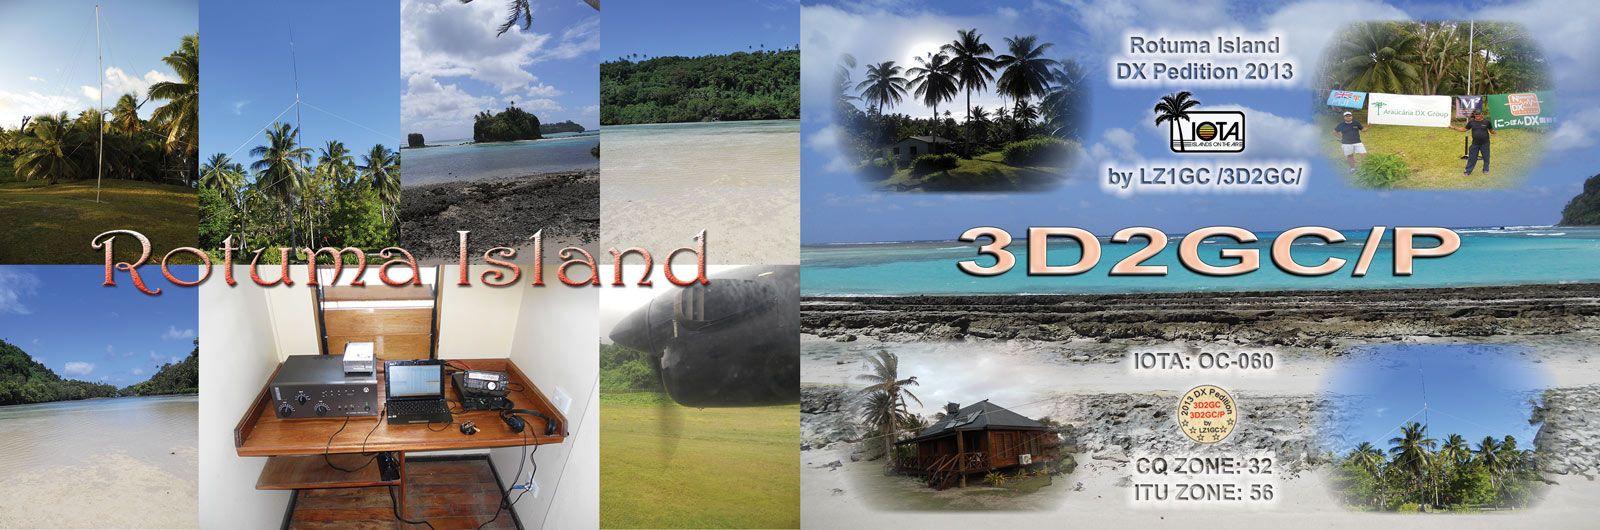 Остров Ротума 3D2GC/P QSL 1